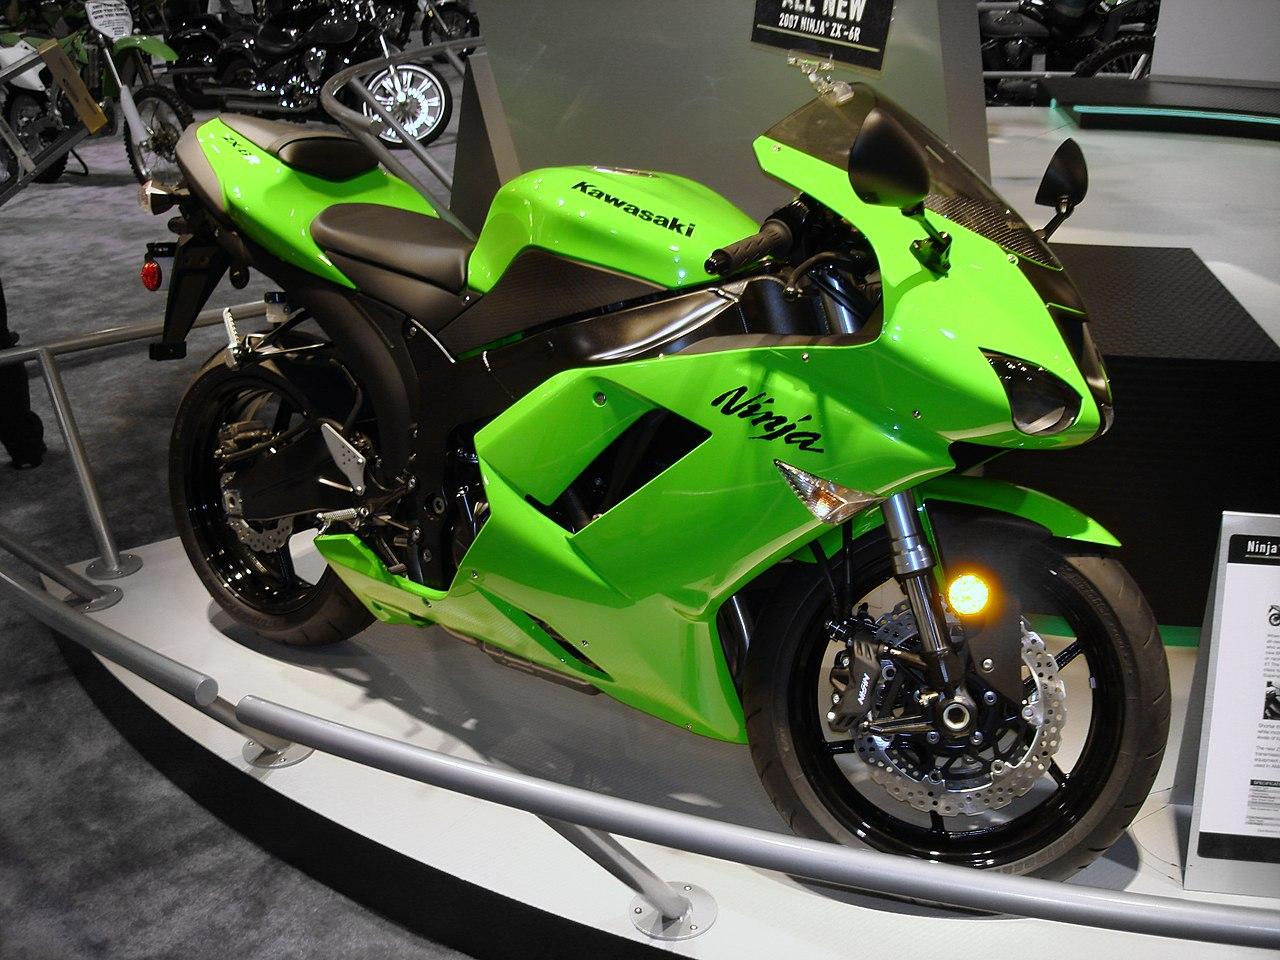 Used Kawasaki Ninja For Sale In Usa